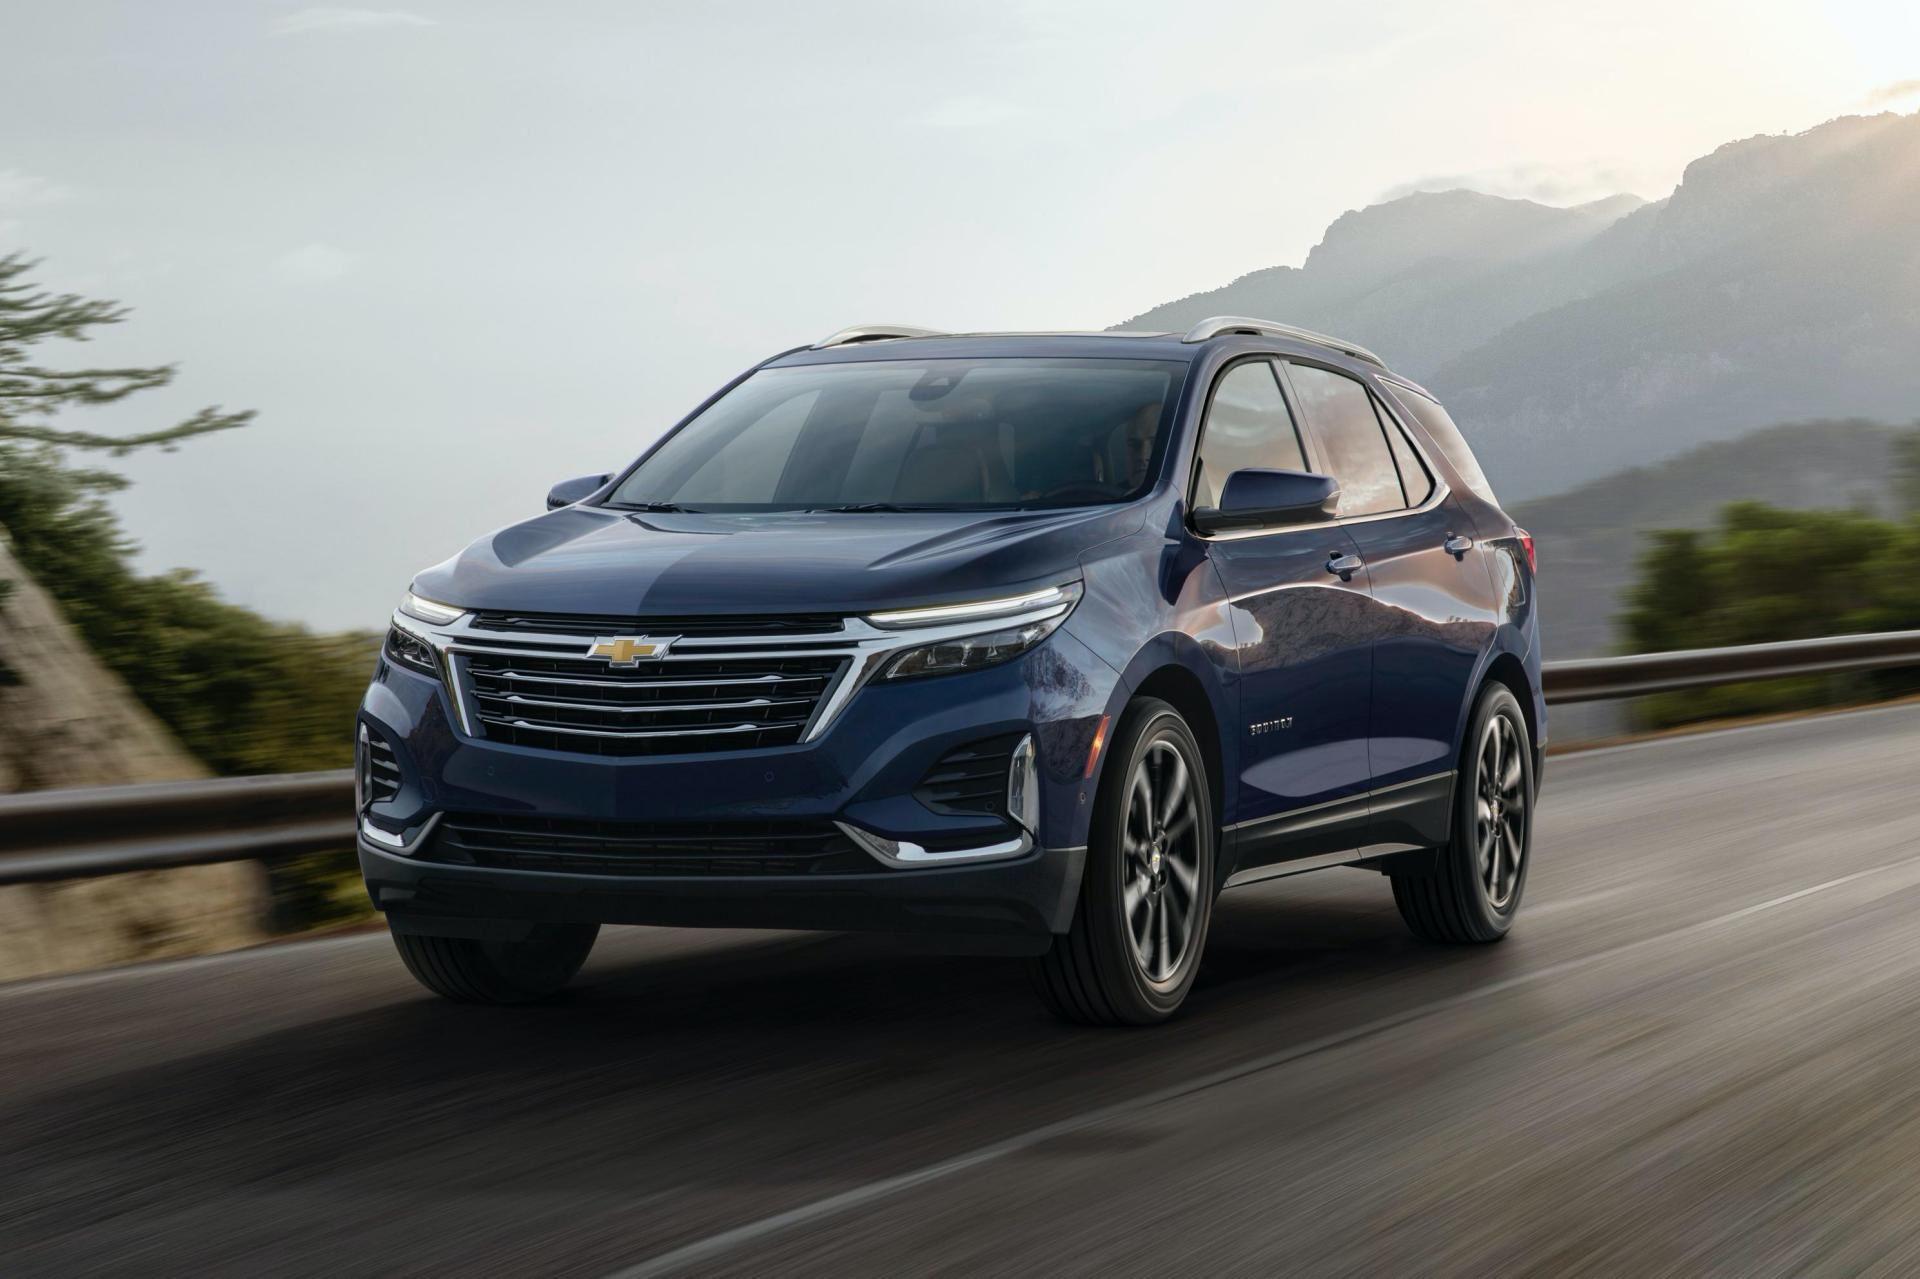 Chevrolet-Equinox-facelift-2020-13